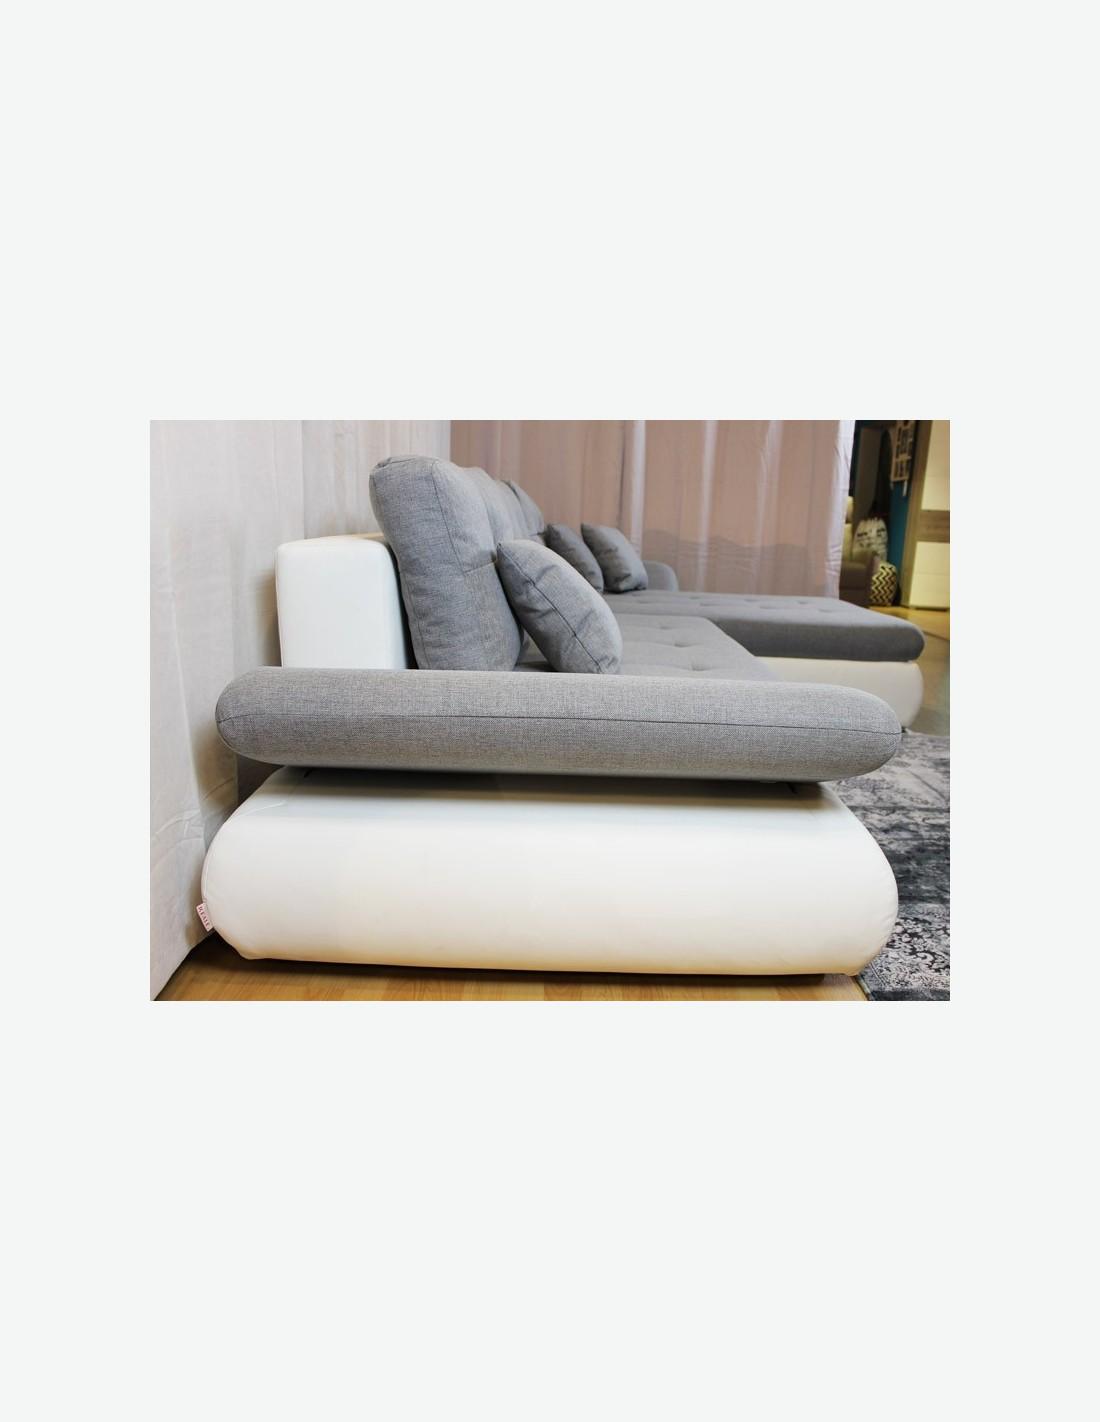 ecksofa mit funktion perfect leder mit enorm couch. Black Bedroom Furniture Sets. Home Design Ideas